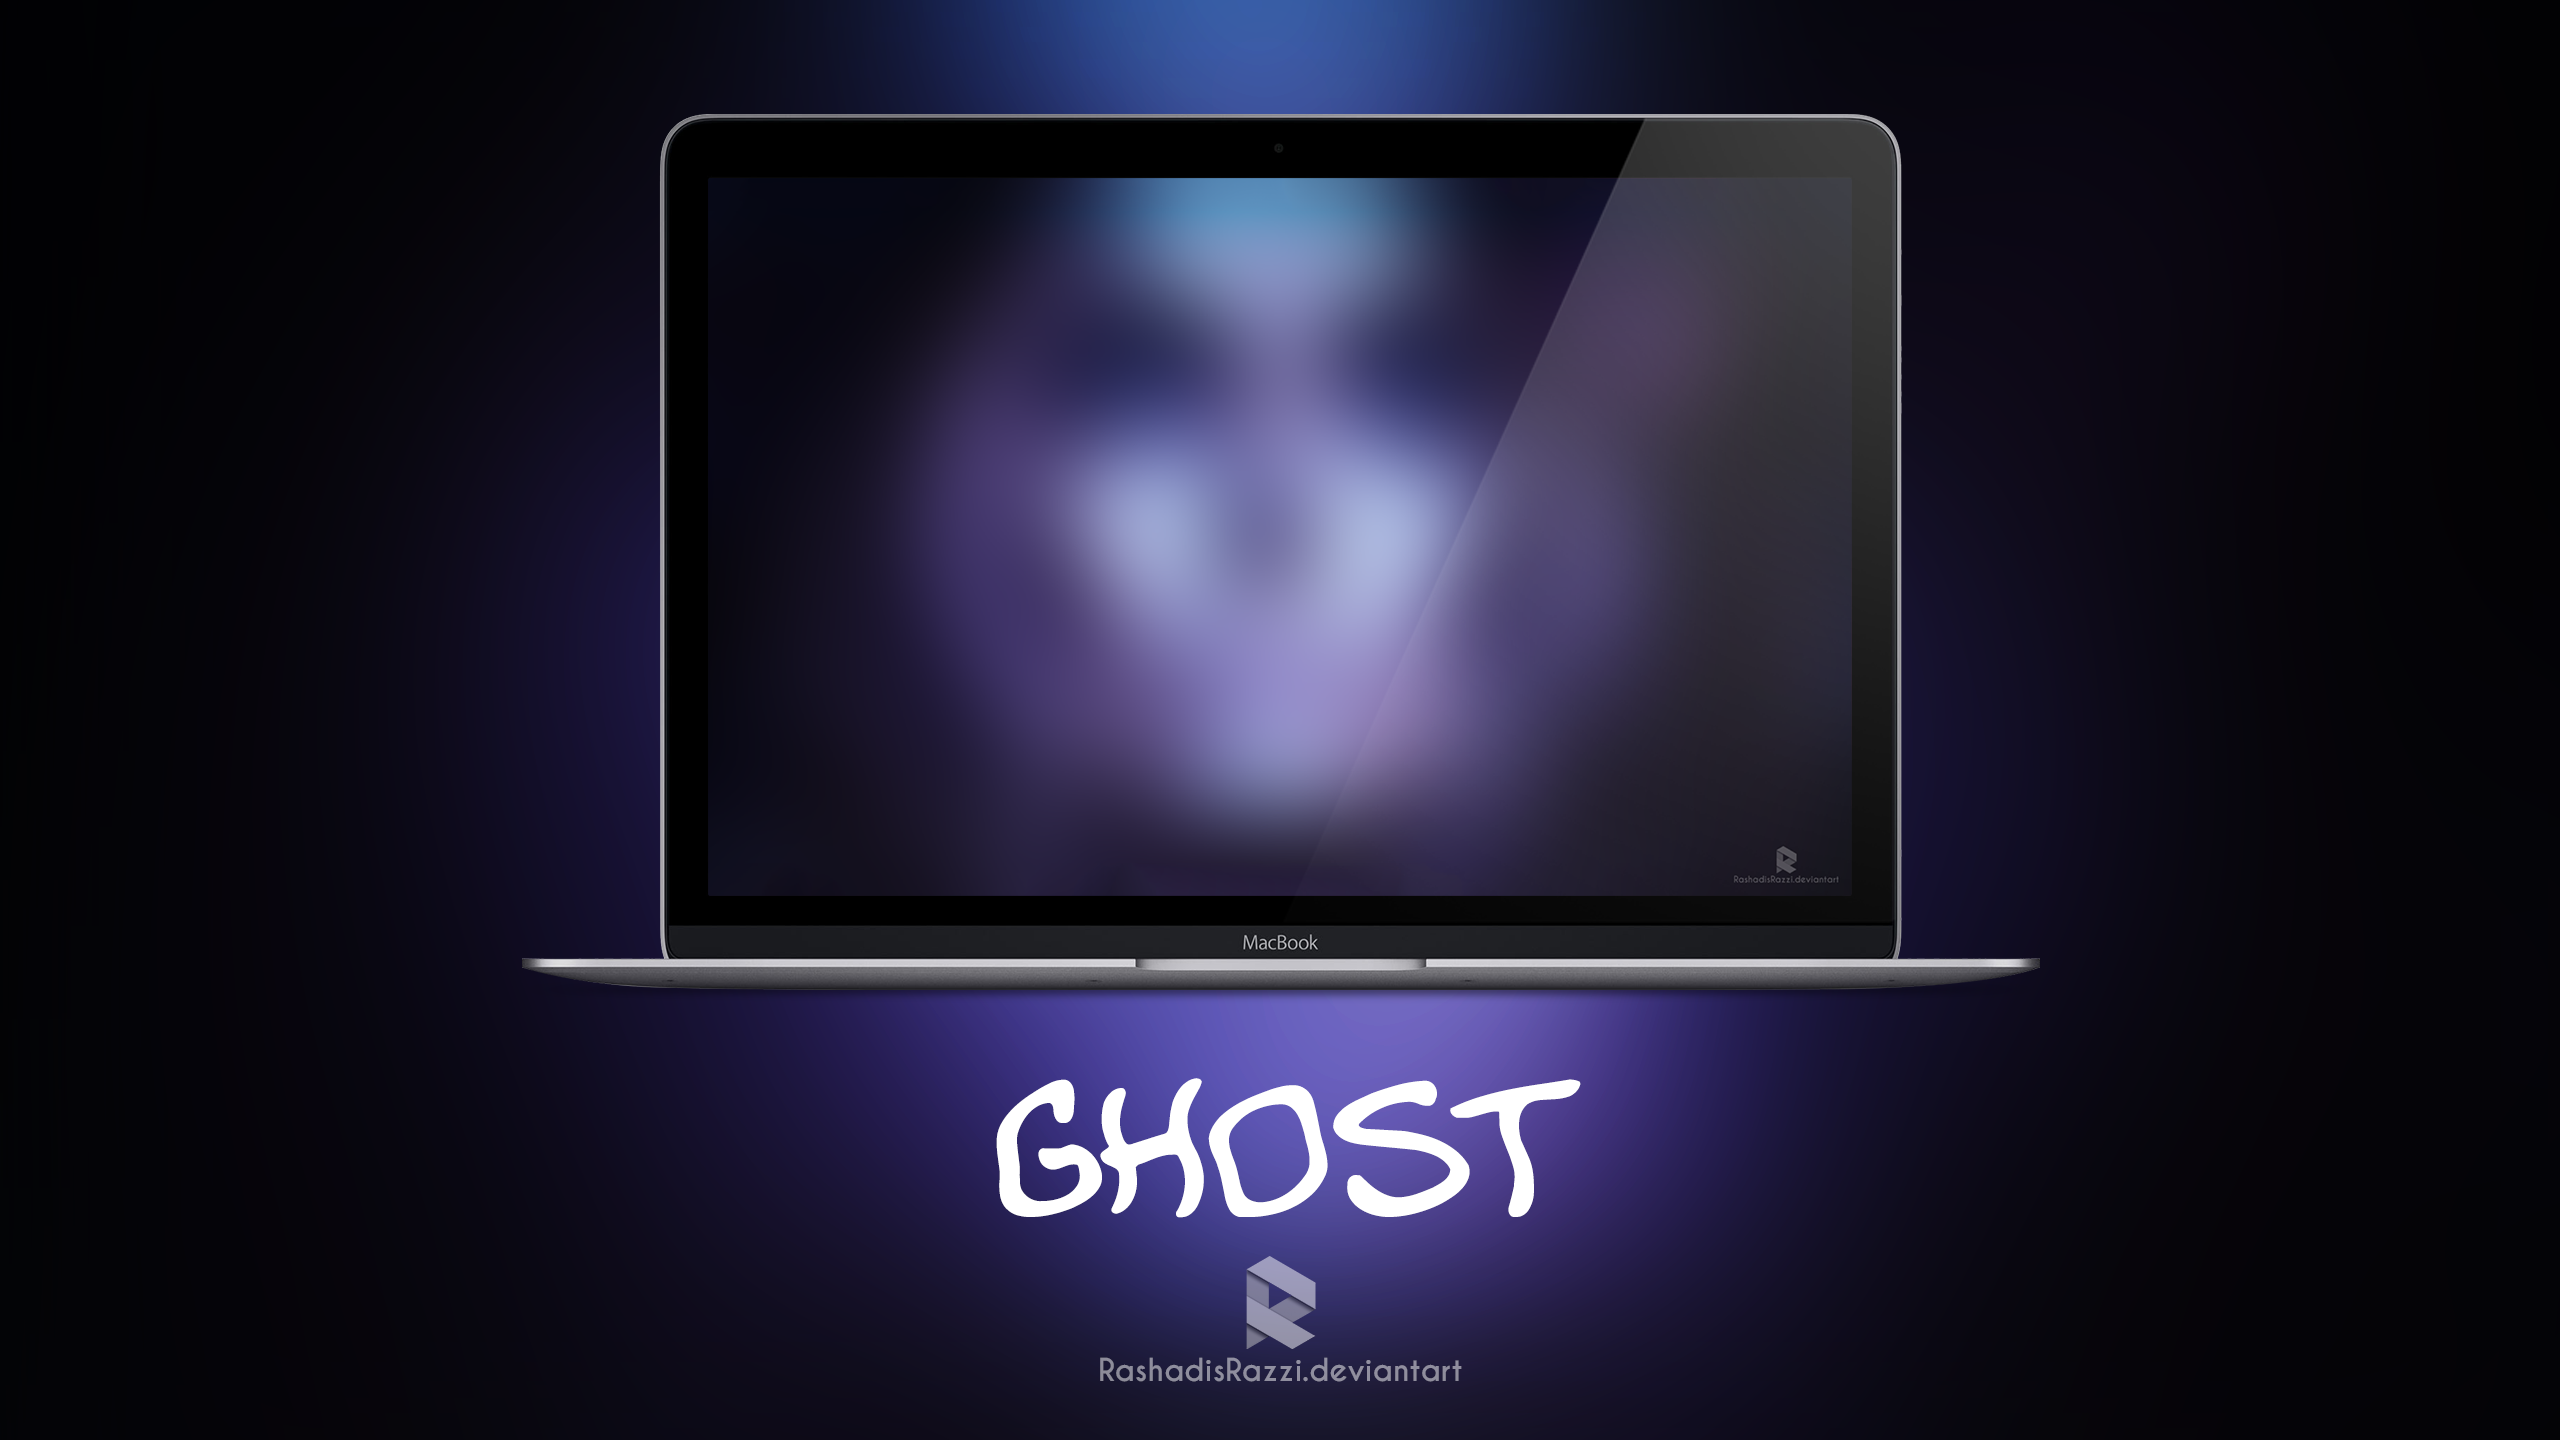 Ghost by rashadisrazzi